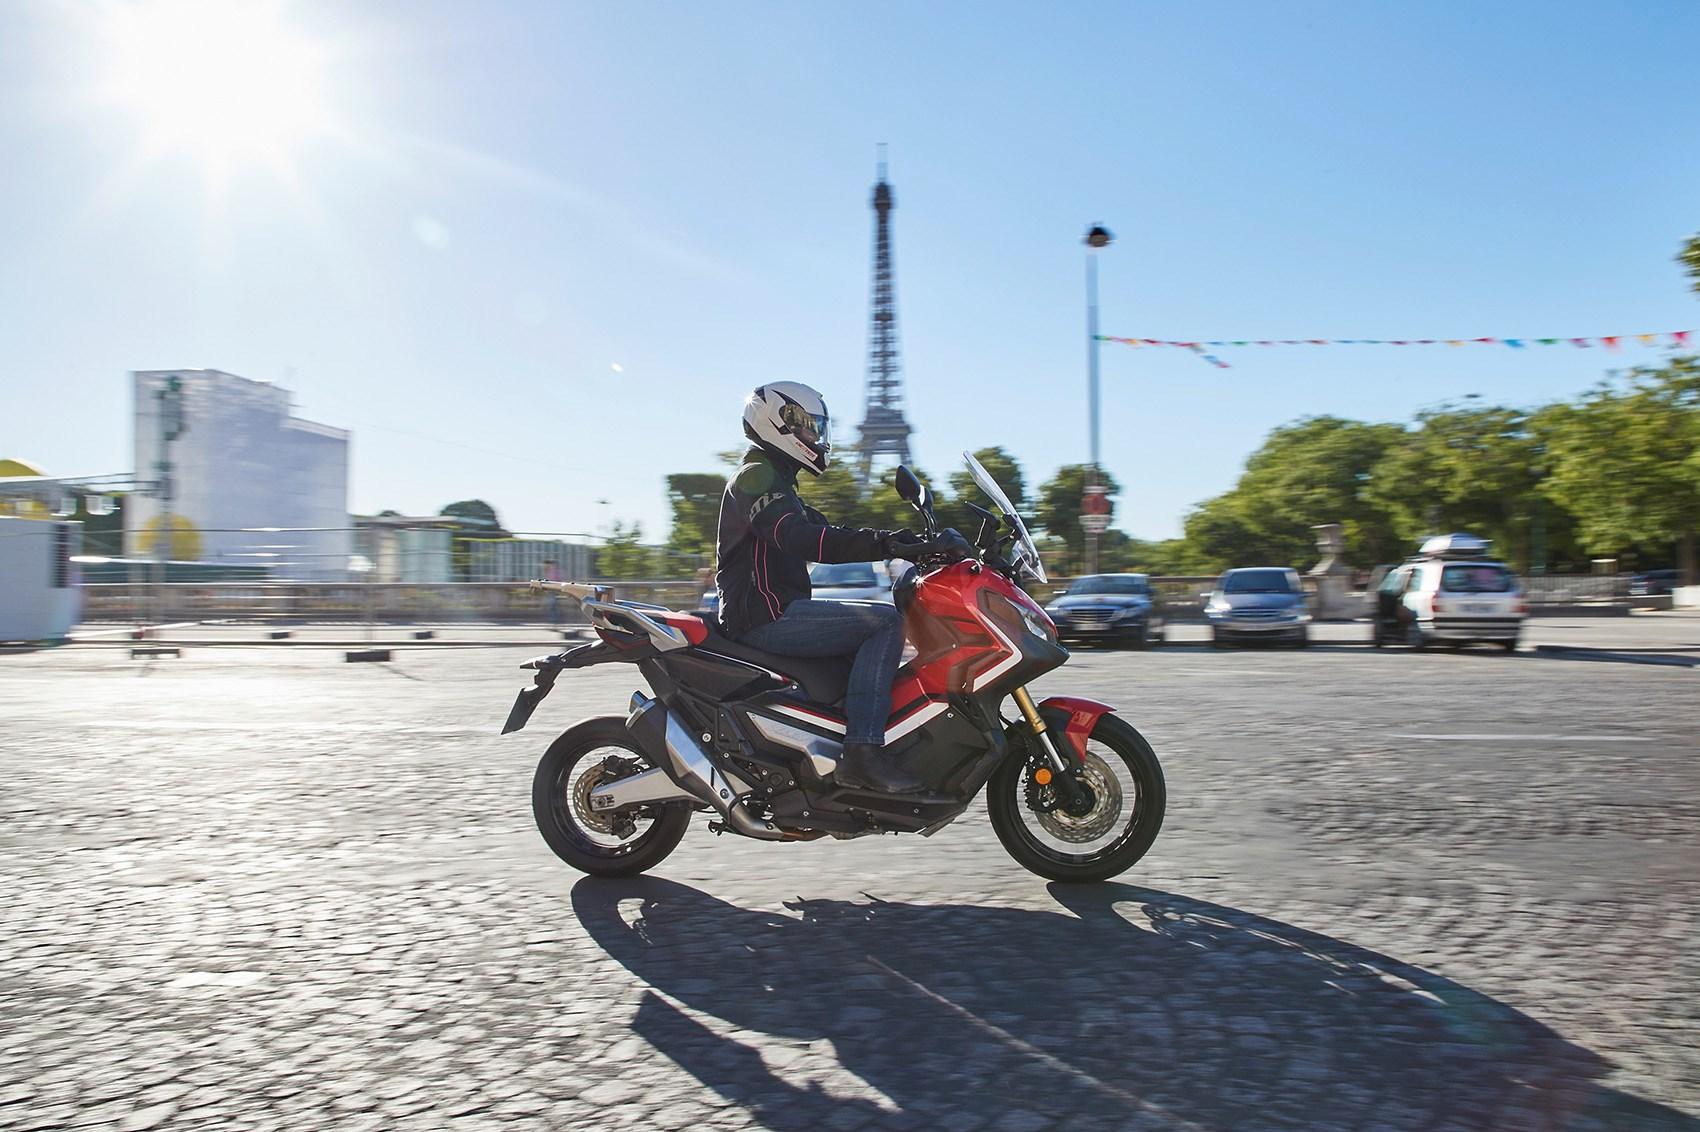 Handlebars: Honda X-ADV (2017) motorcycle review | CAR Magazine